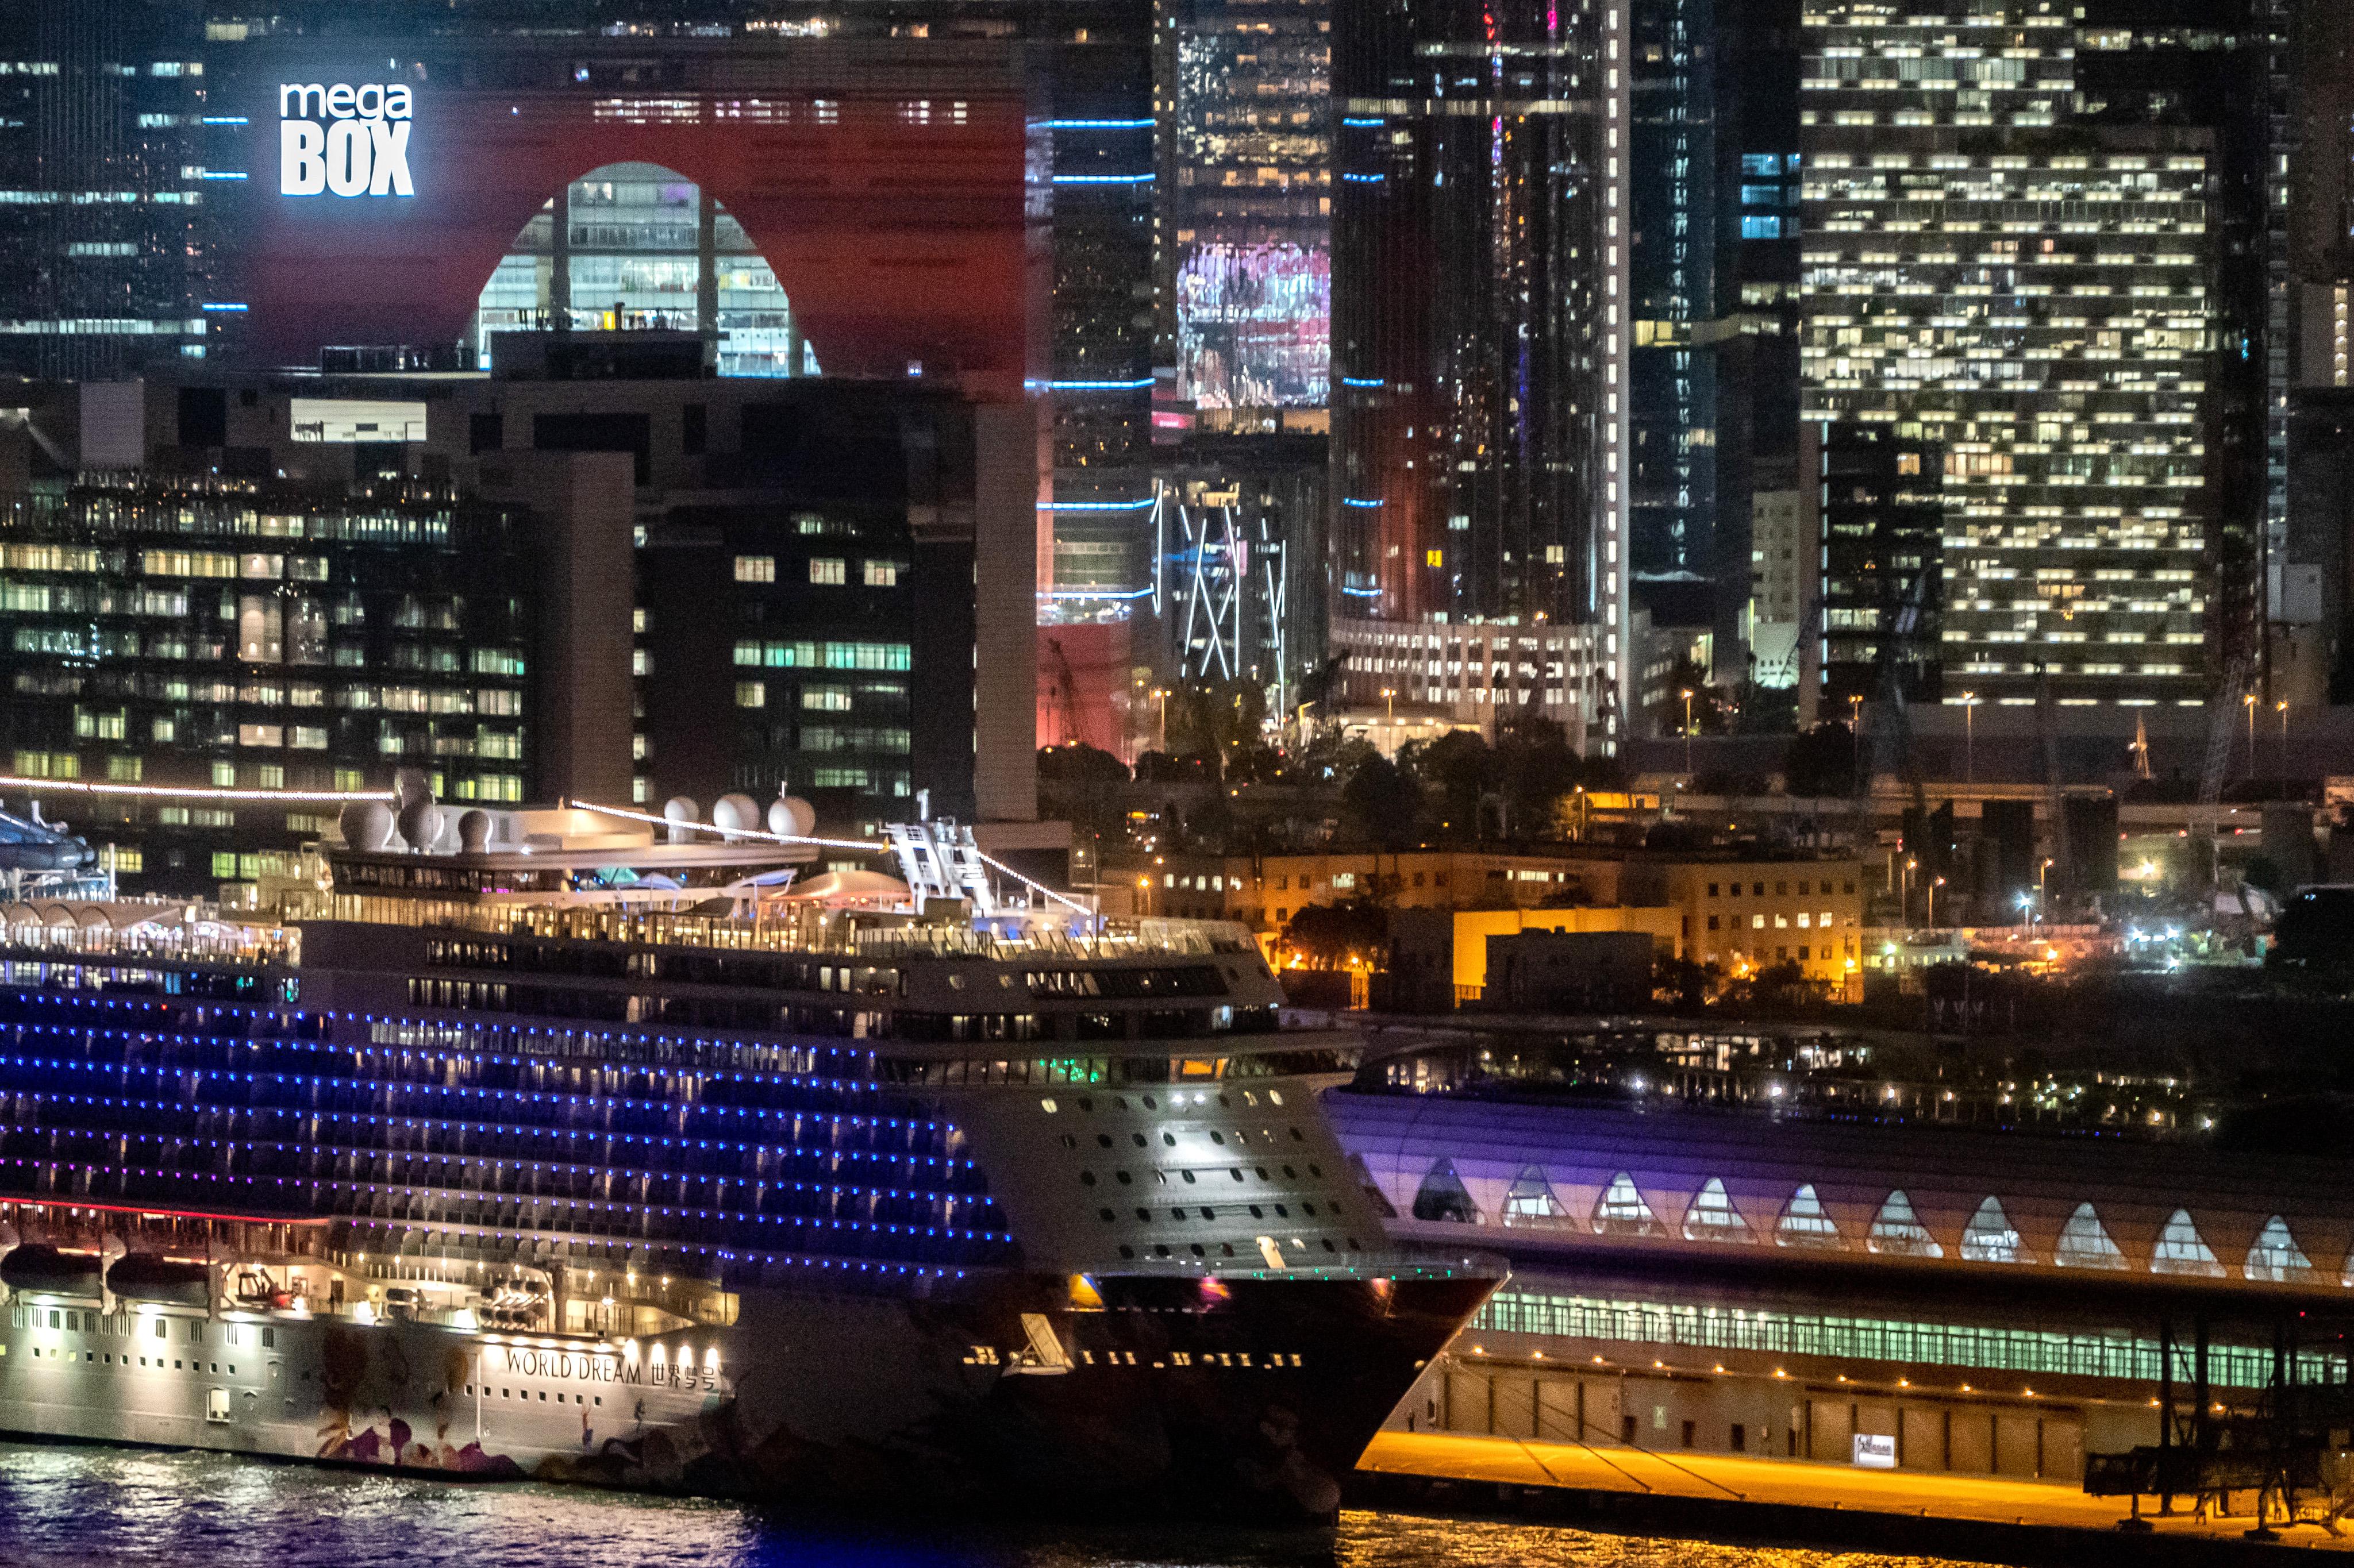 The World Dream cruise ship sits moored at Kai Tak Cruise Terminal on February 5, 2020 in Hong Kong, China.